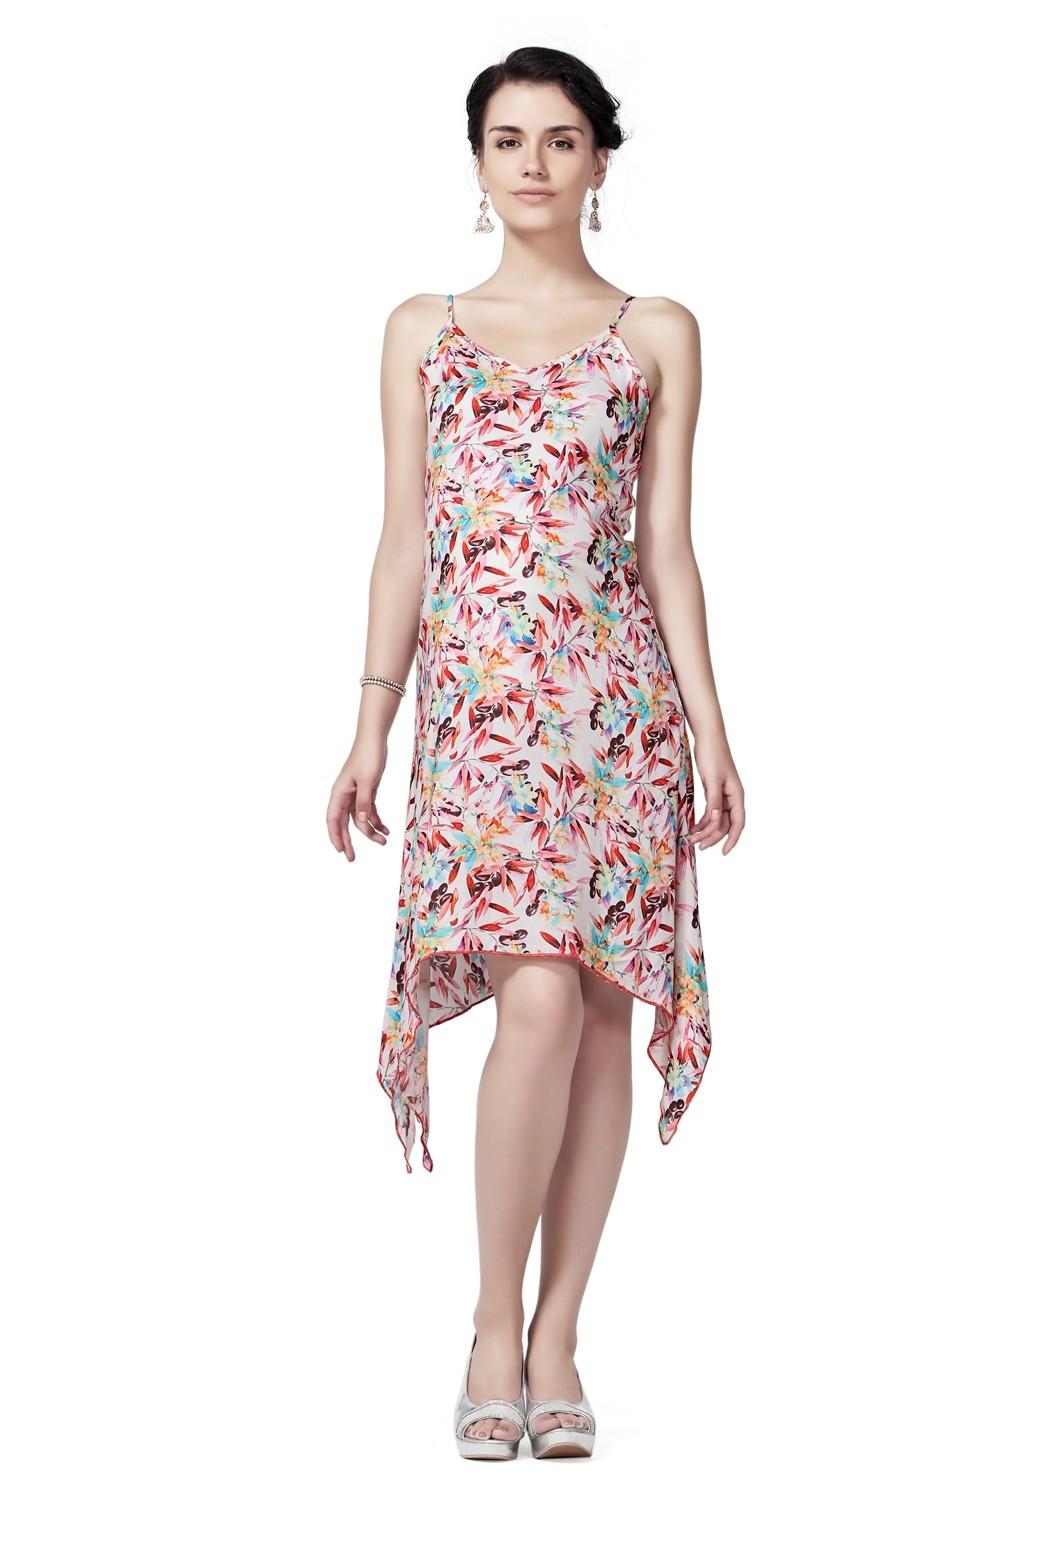 Maternity Sundress   Plus Size Maternity Sundresses   Jessica Simpson Pregnancy Clothes